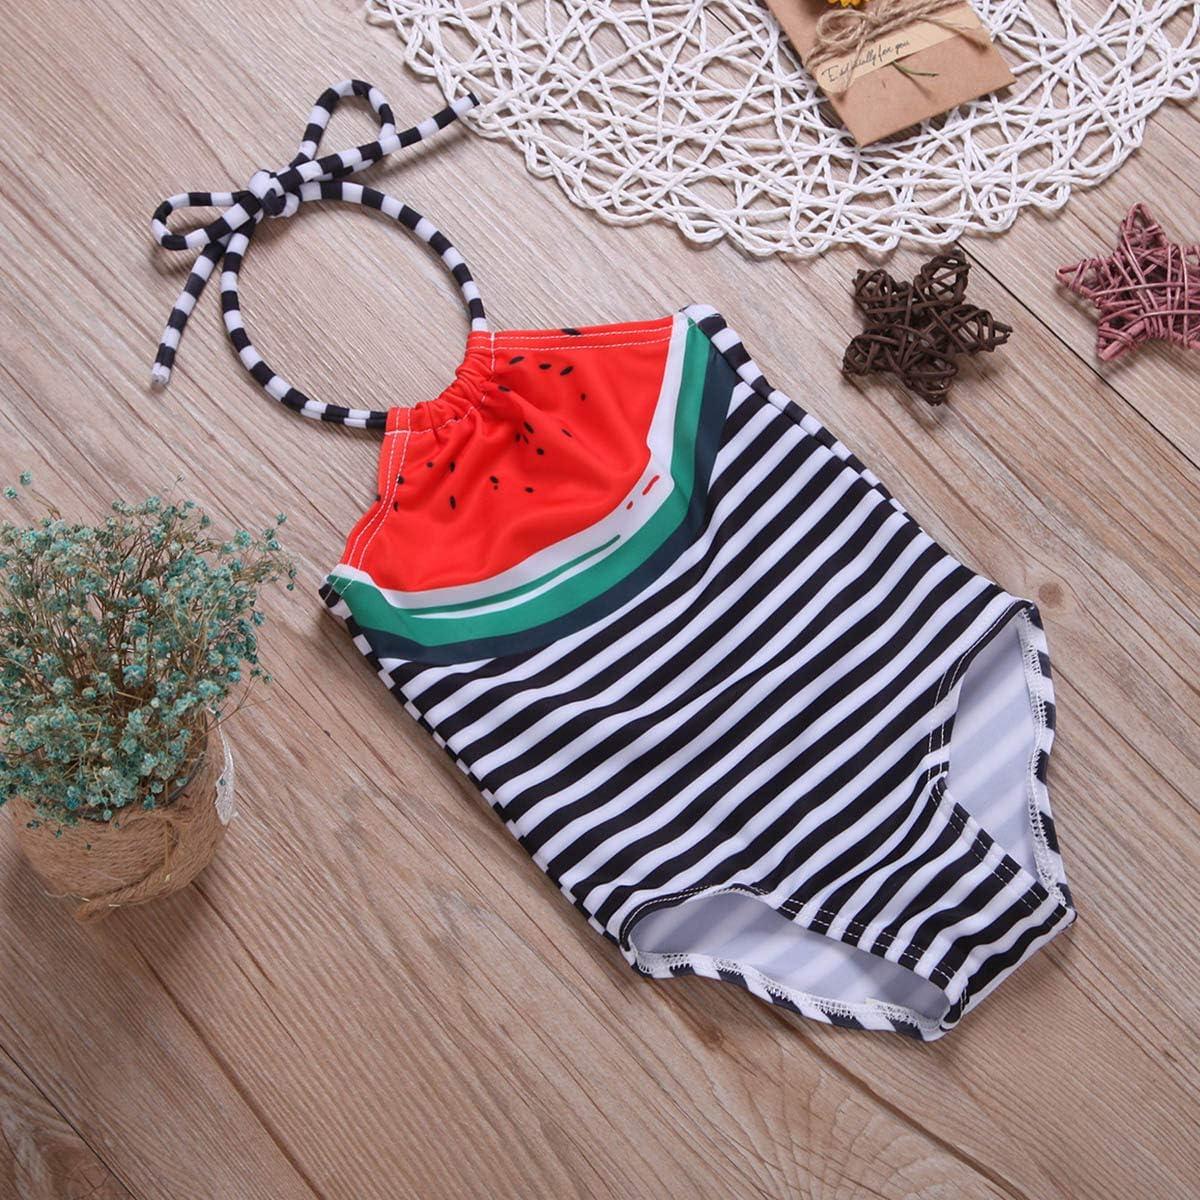 Toddler Kids Baby Girl Swimsuits Striped Straps Bikini Tassel Swimwear Kids Halter Bathing Suit Beach Wear